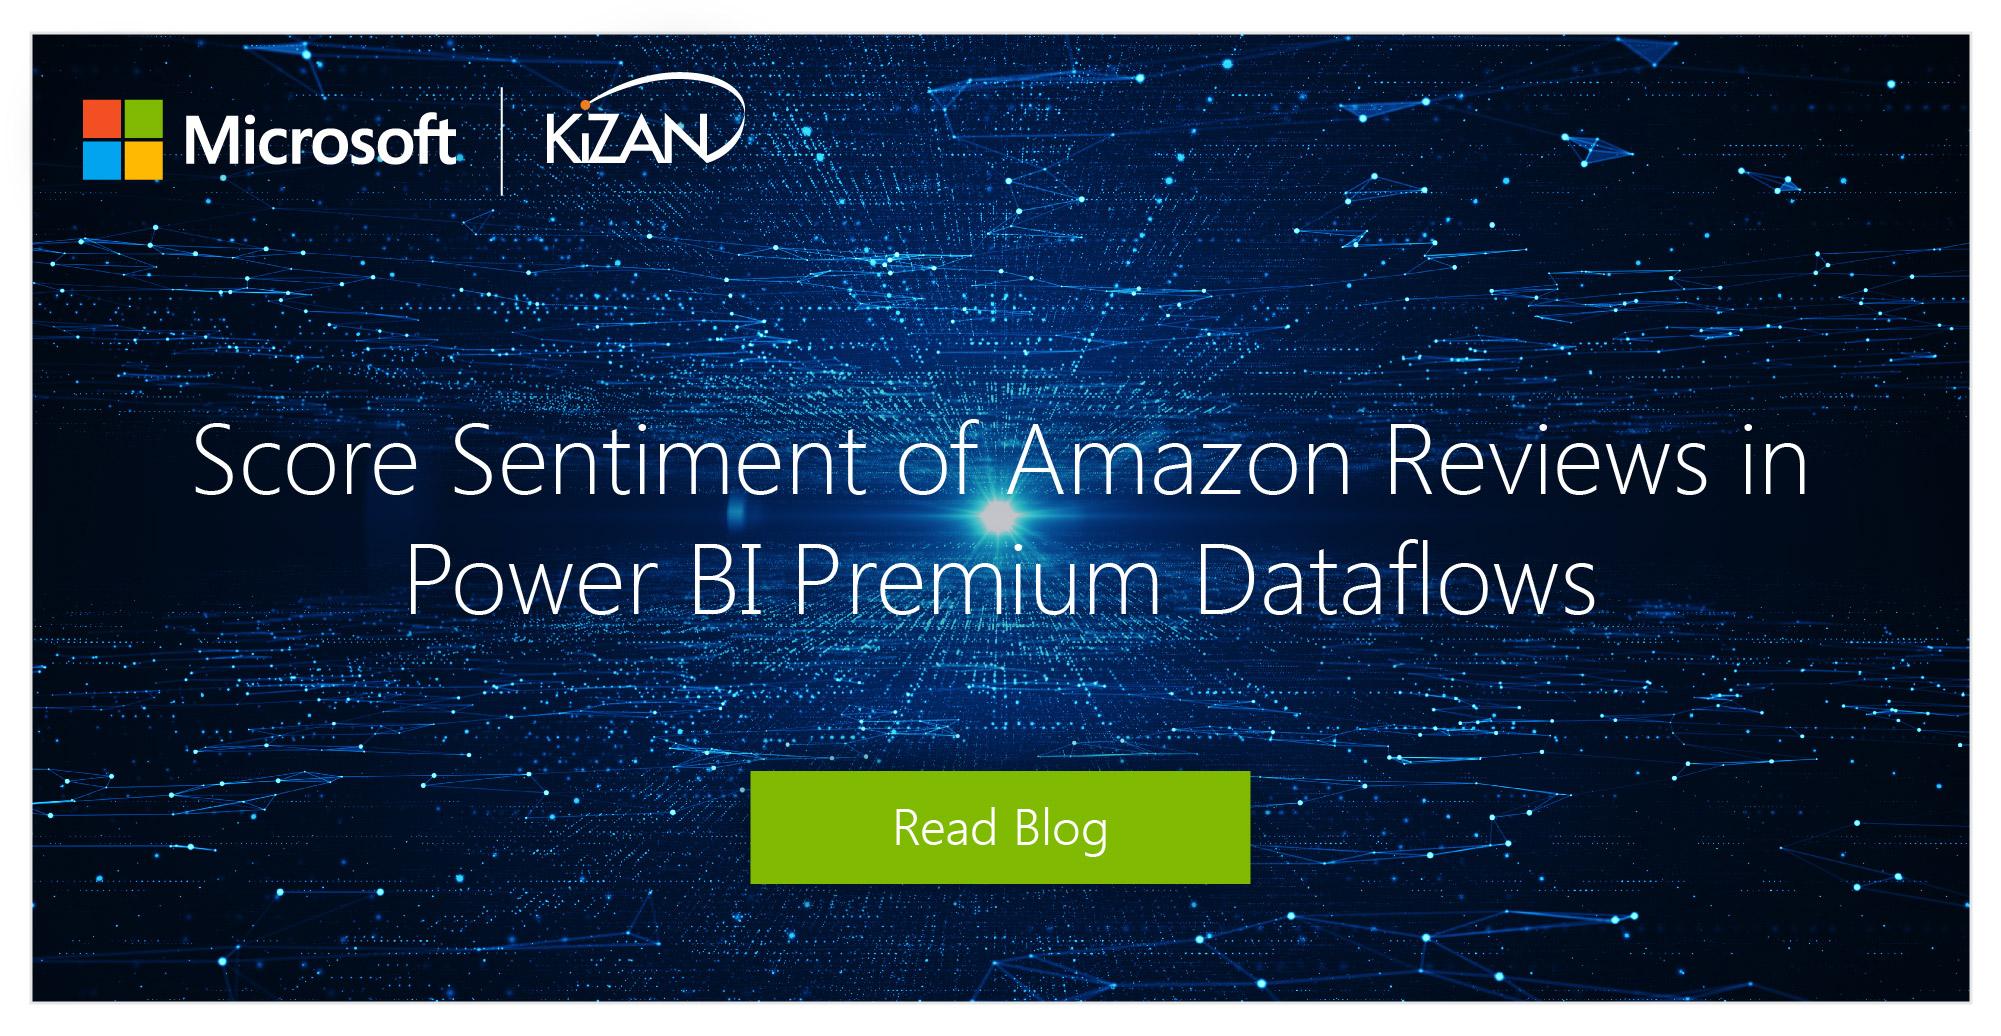 Score Sentiment of Amazon Reviews in Power BI Premium Dataflows